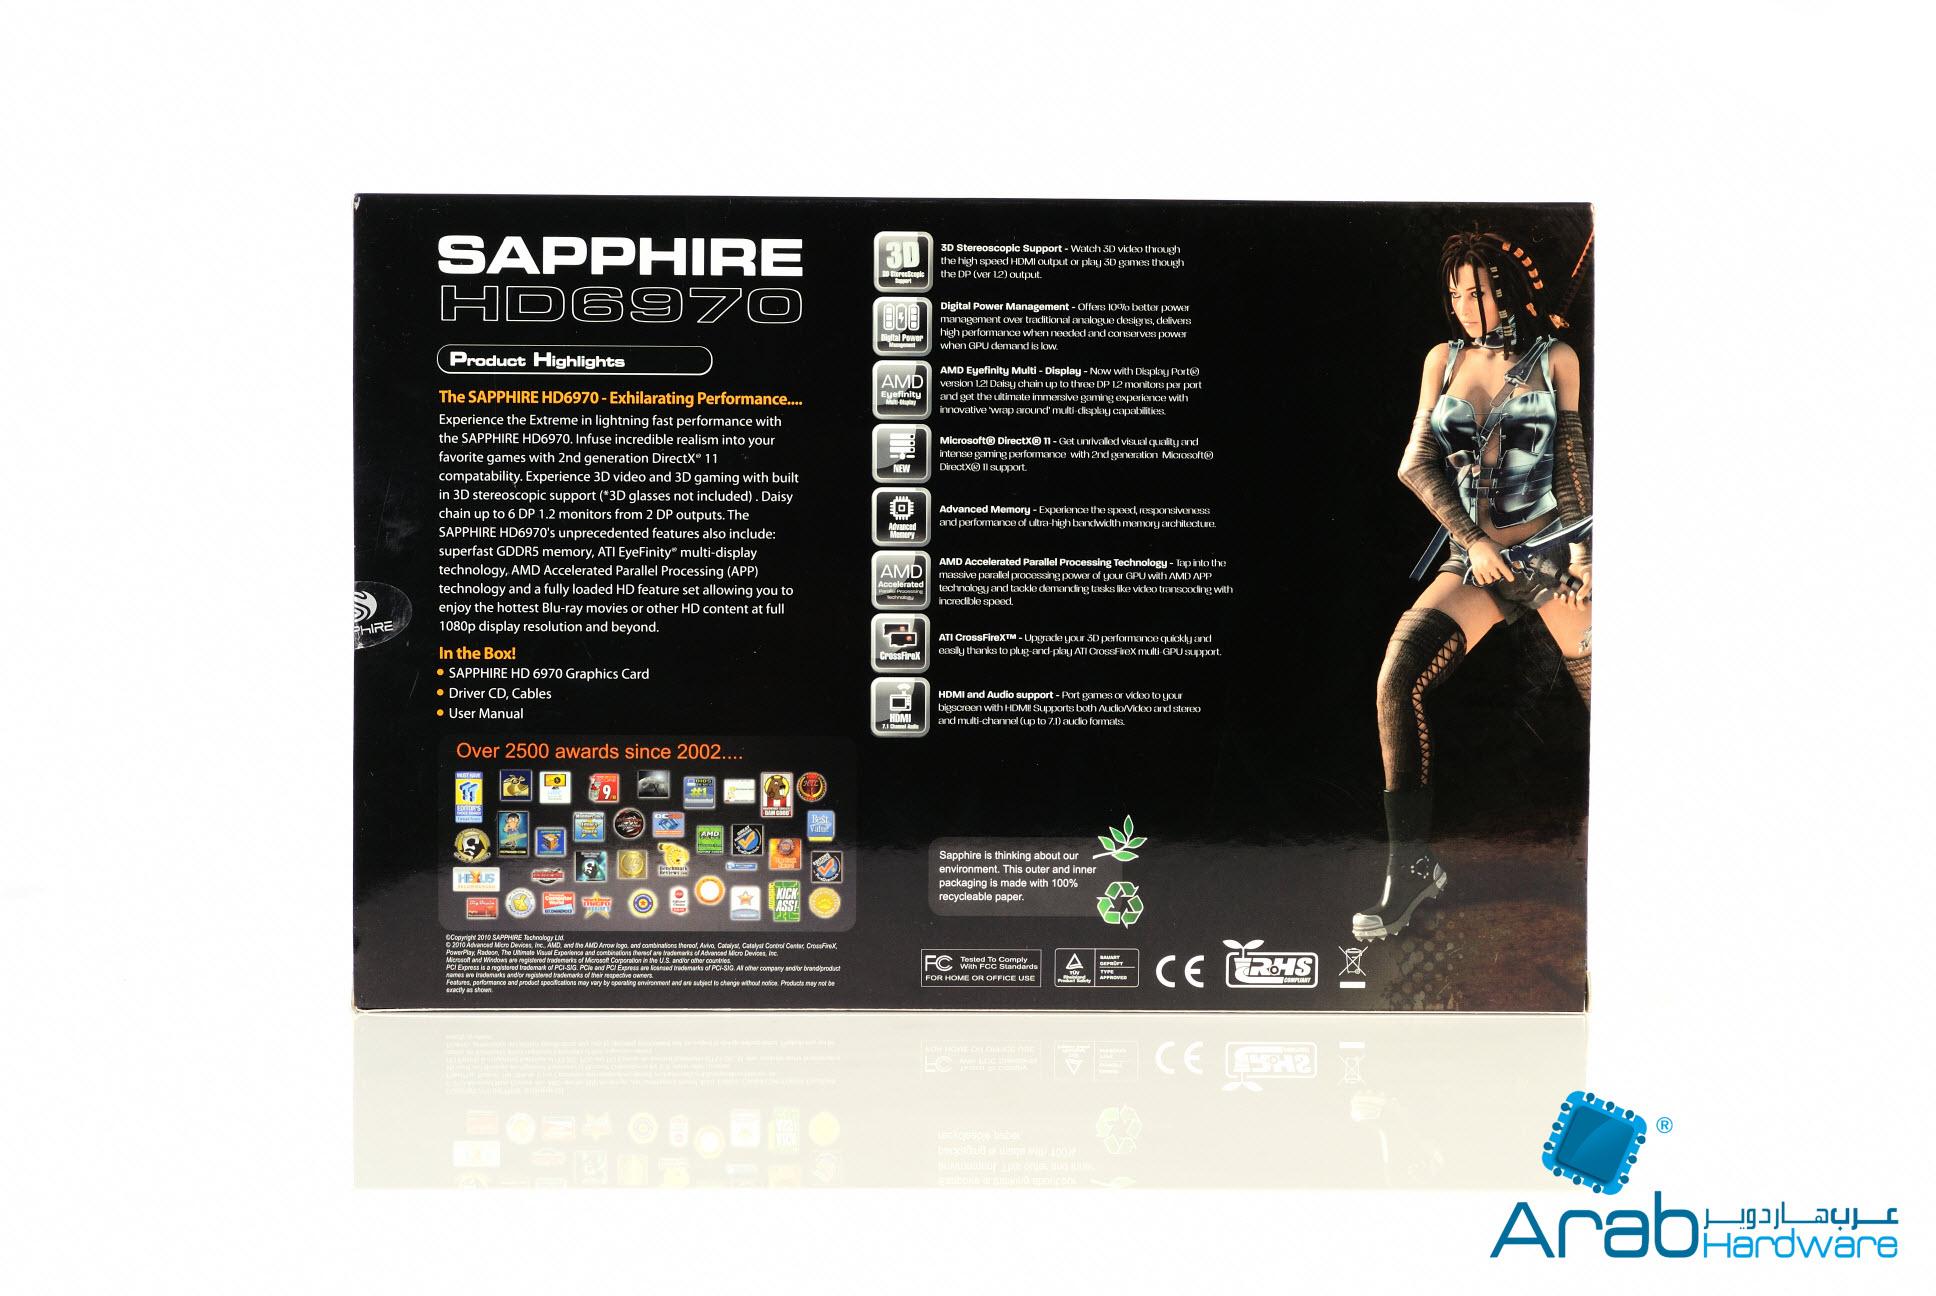 Sapphire HD6970